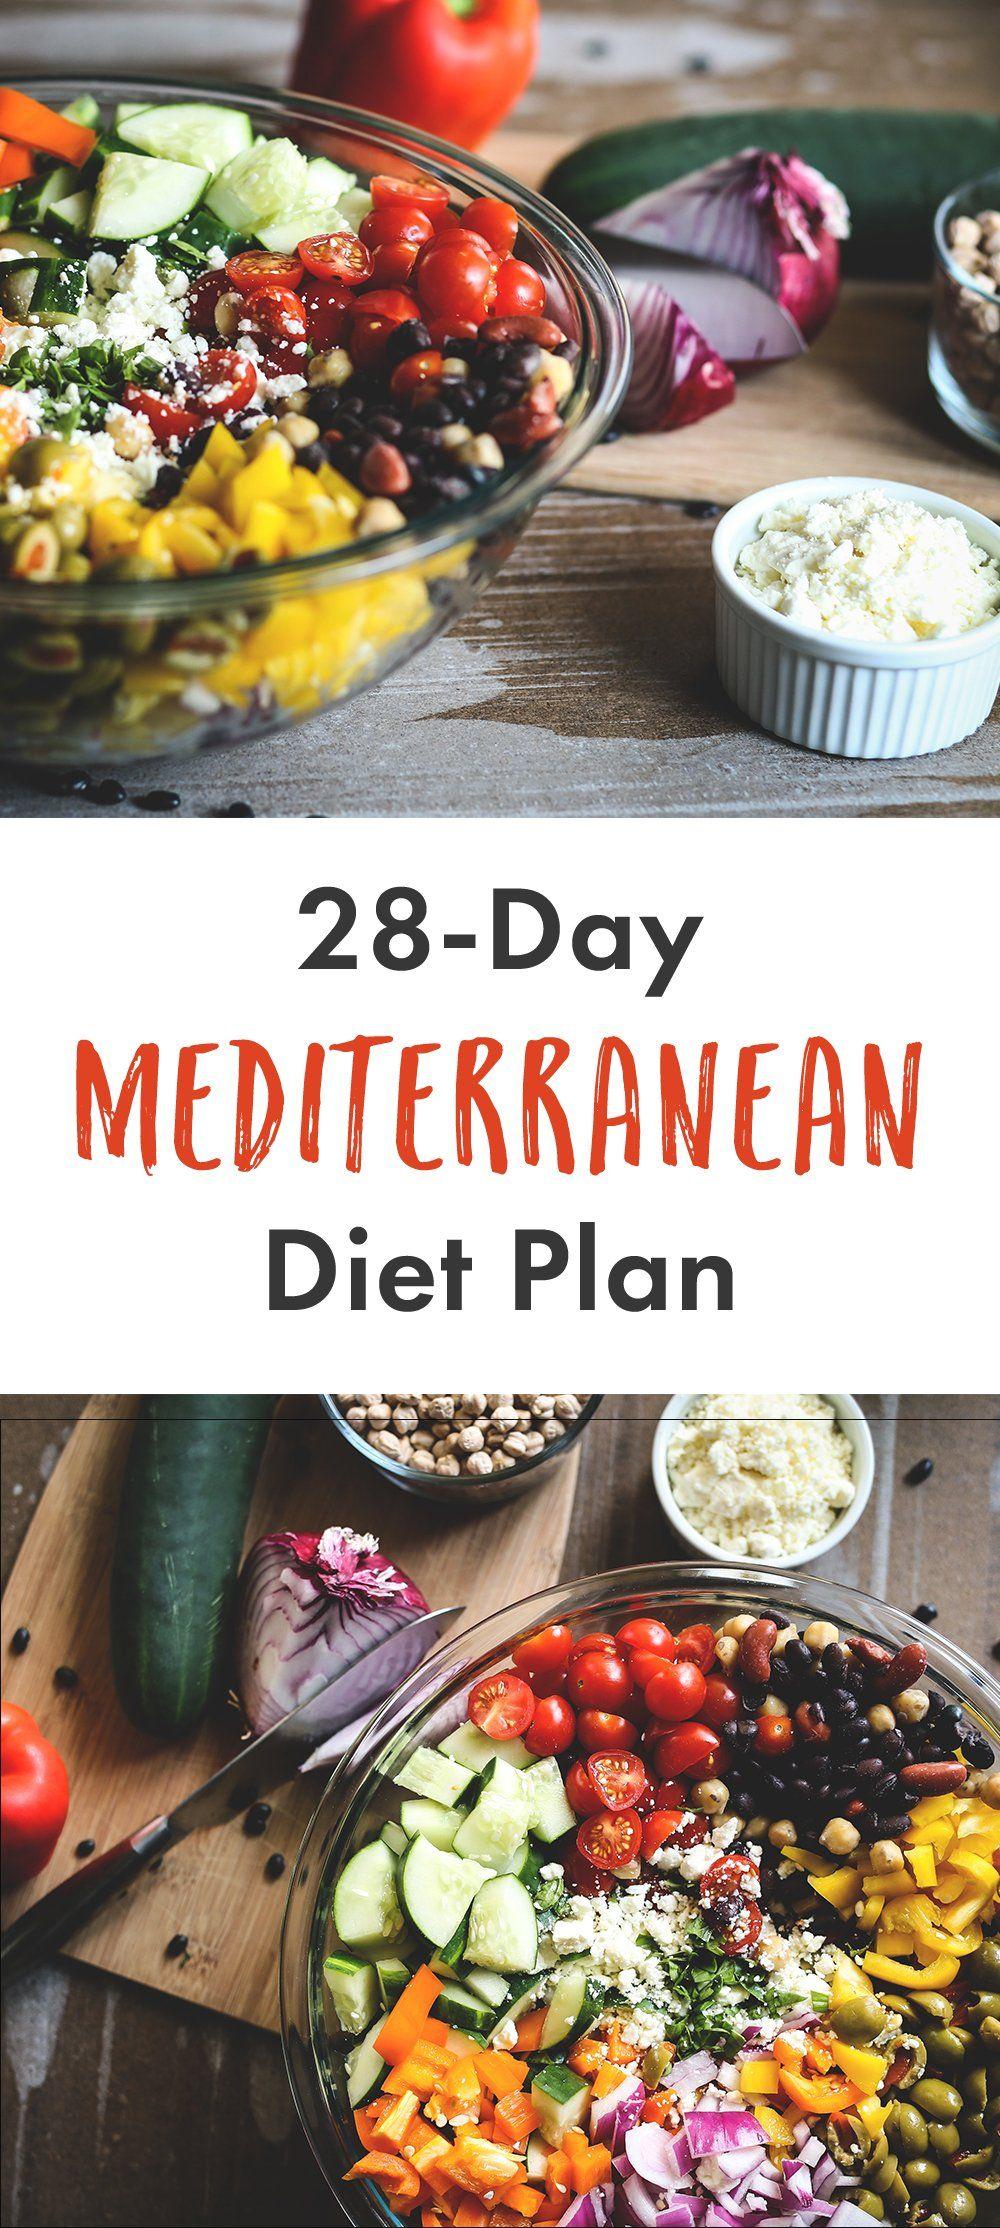 28 Day Mediterranean Diet Plan | Livestrong.com